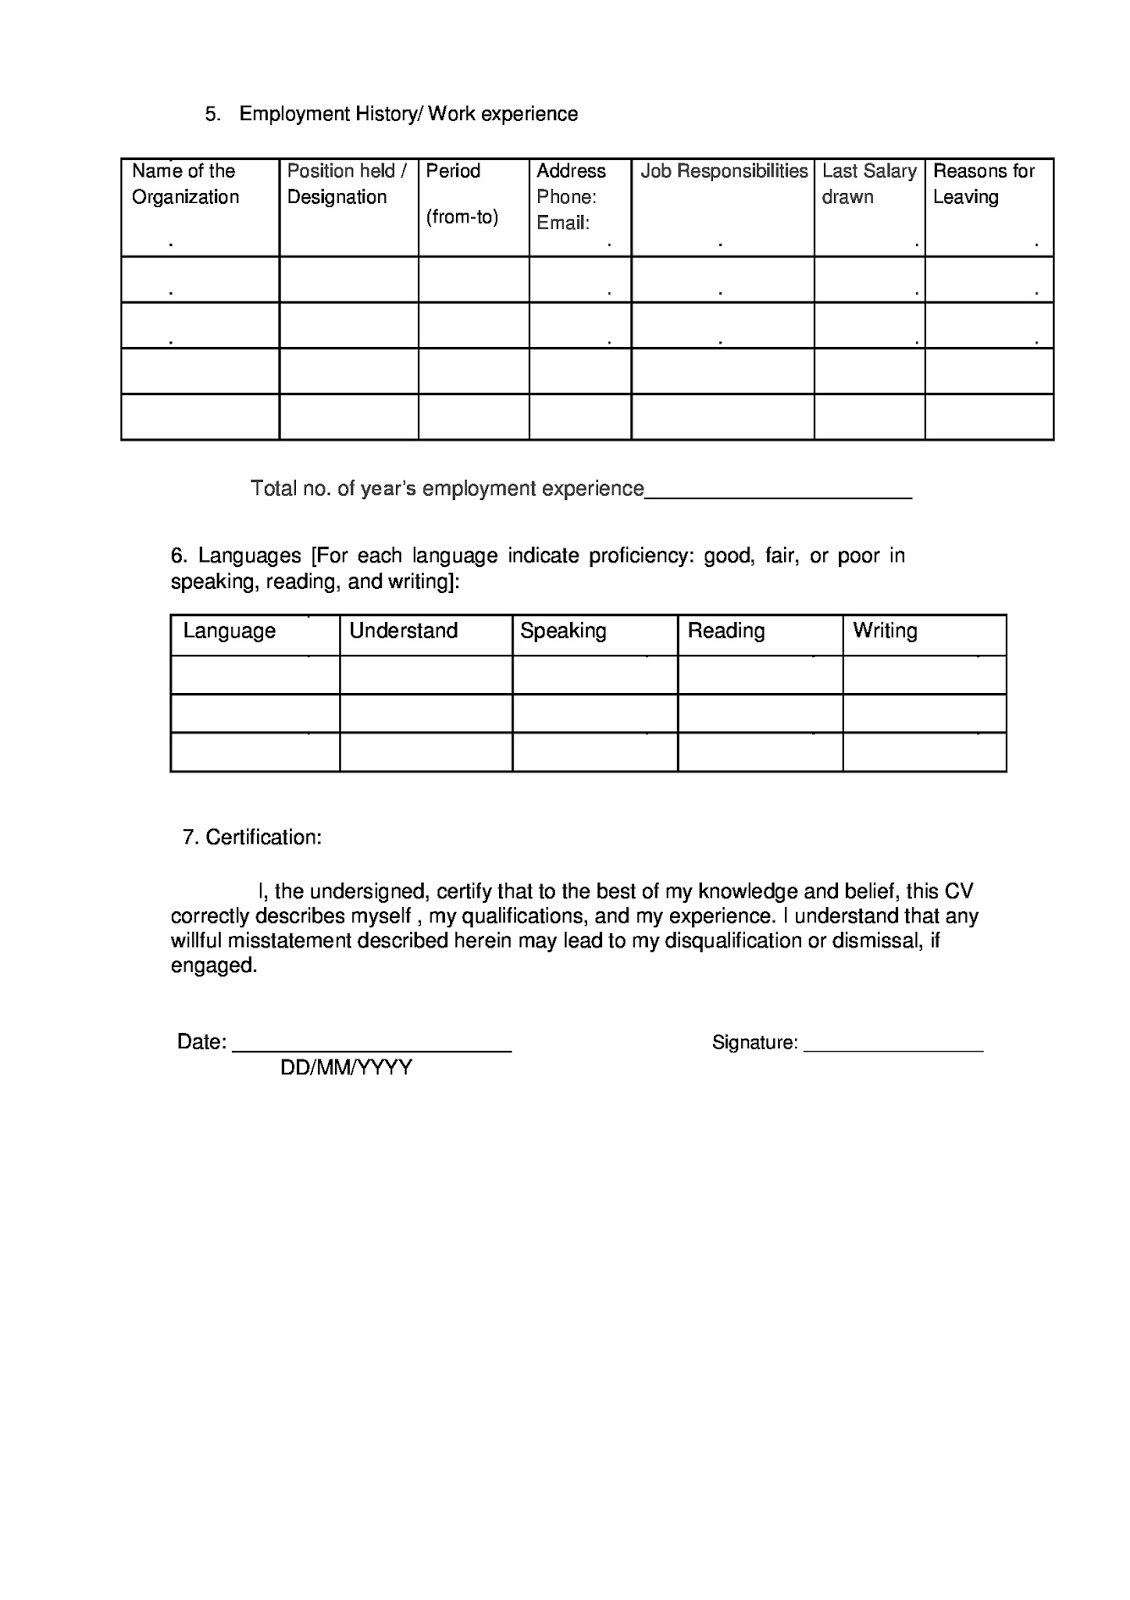 Agriculture job application form choice image standard form examples application form latest job alerts today namaste kadapa application form word file falaconquin falaconquin